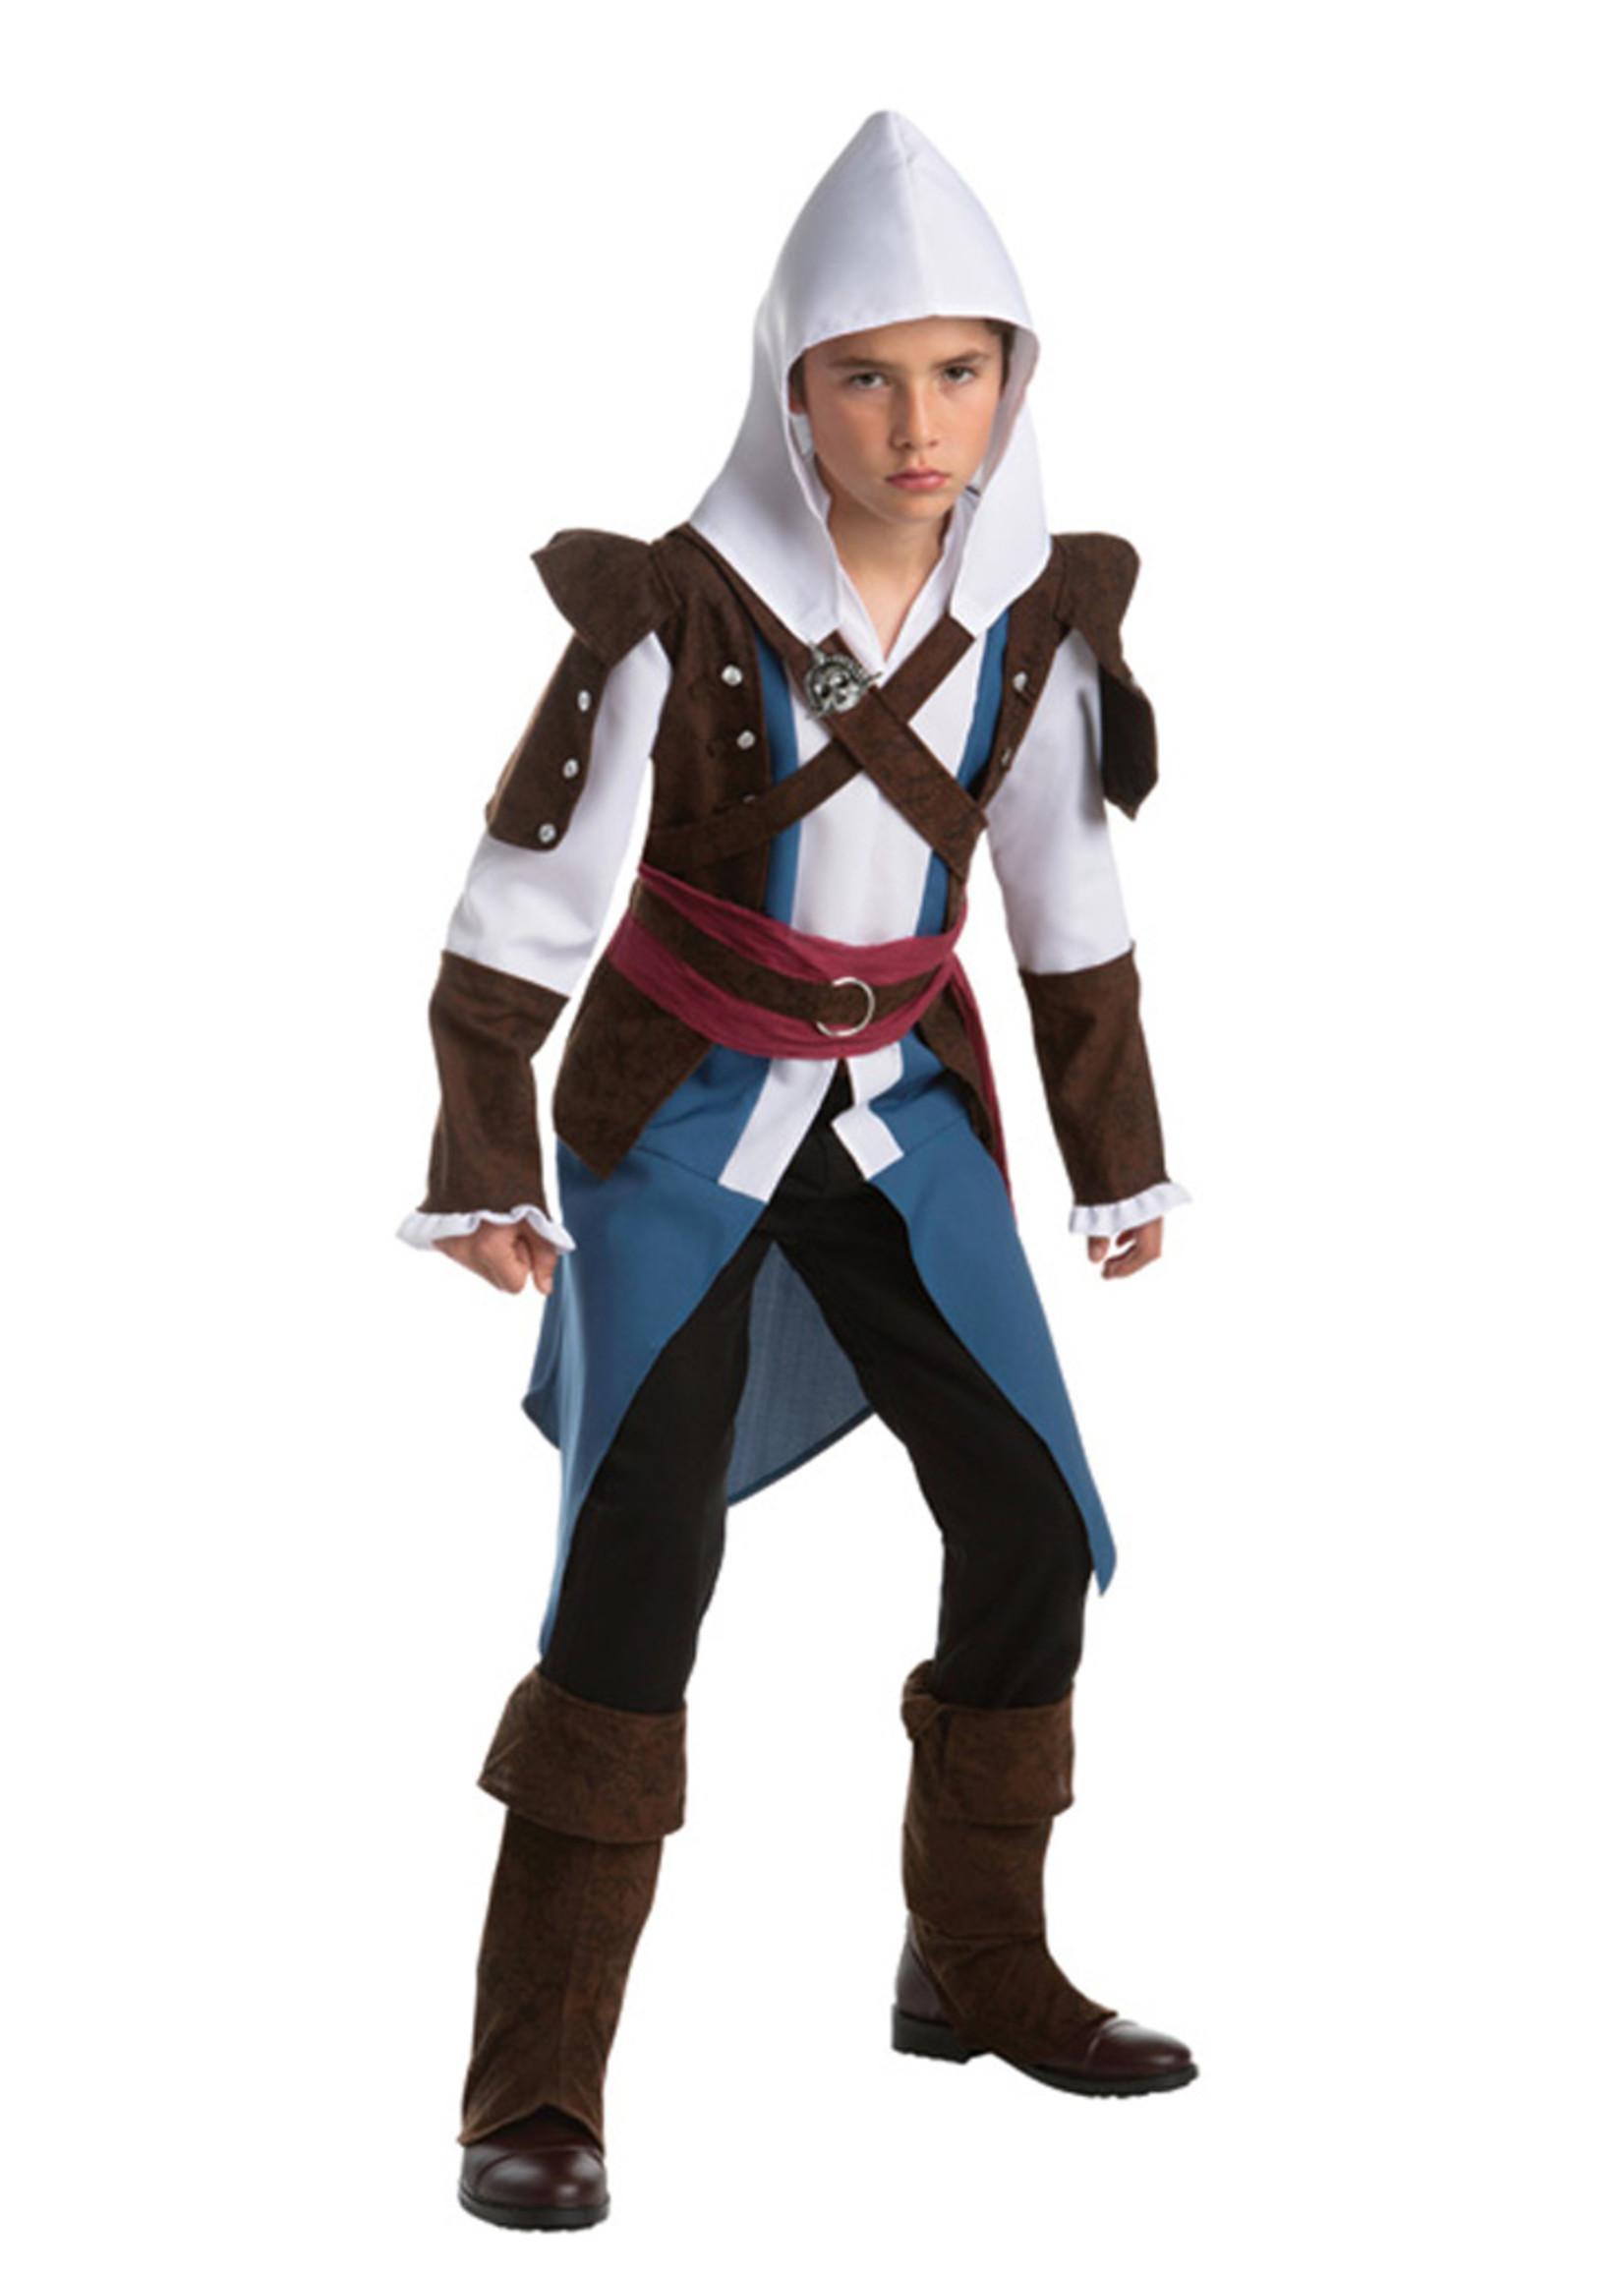 Edward - Assassin's Creed Costume - Boys